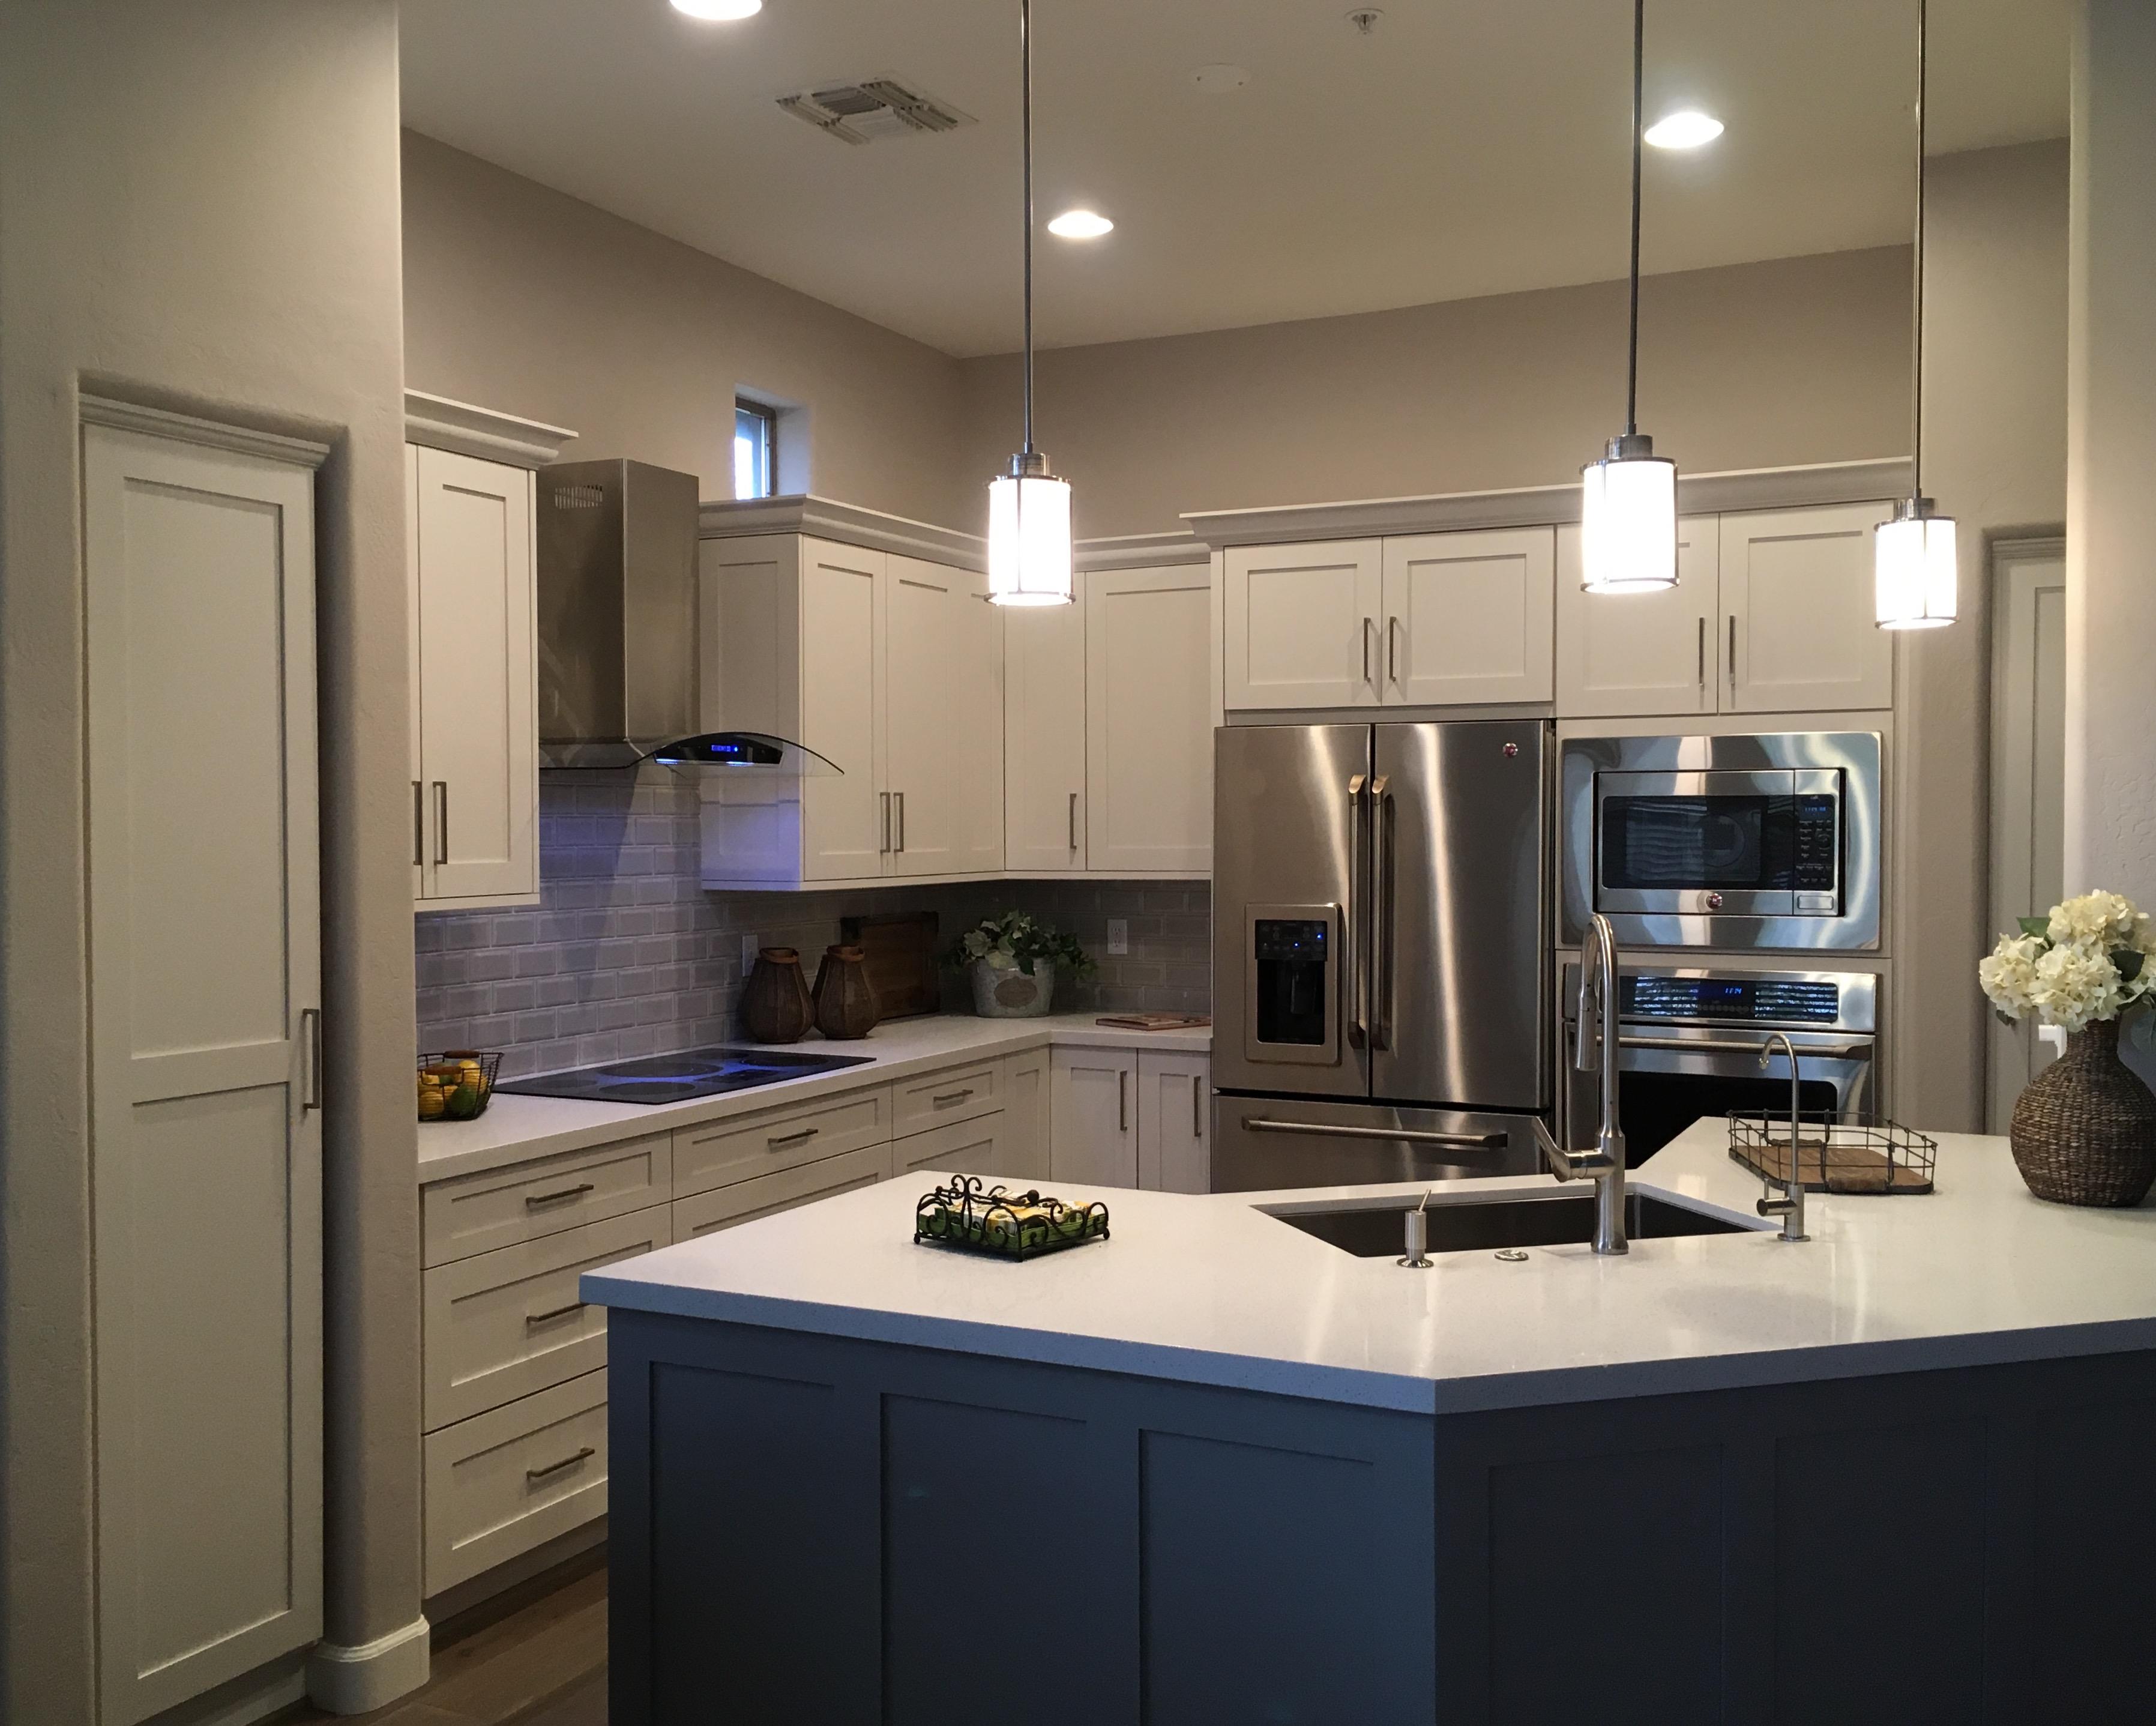 Fallone Kitchen & Bath – Best Kitchen and Bath Remodelers in Scottsdale